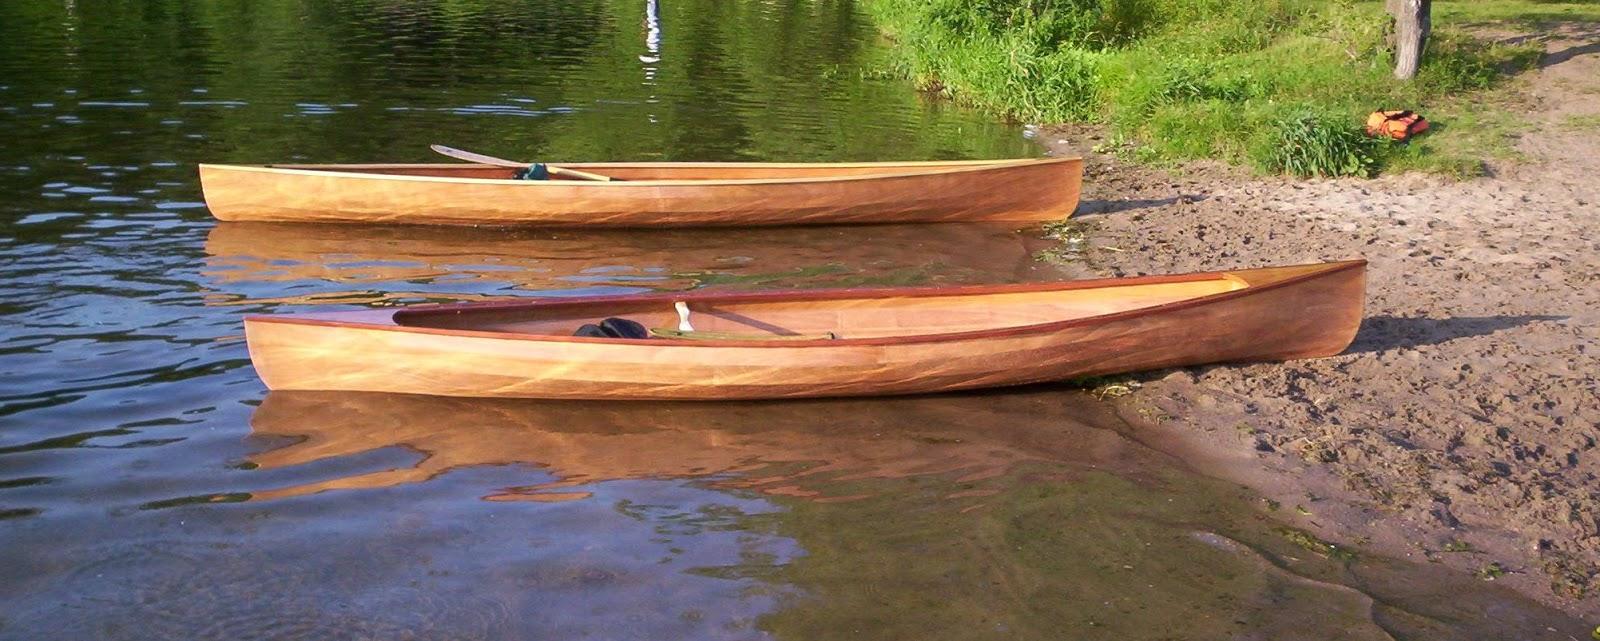 Building $20 Cardboard Boats! - YouTube   Canoe Design